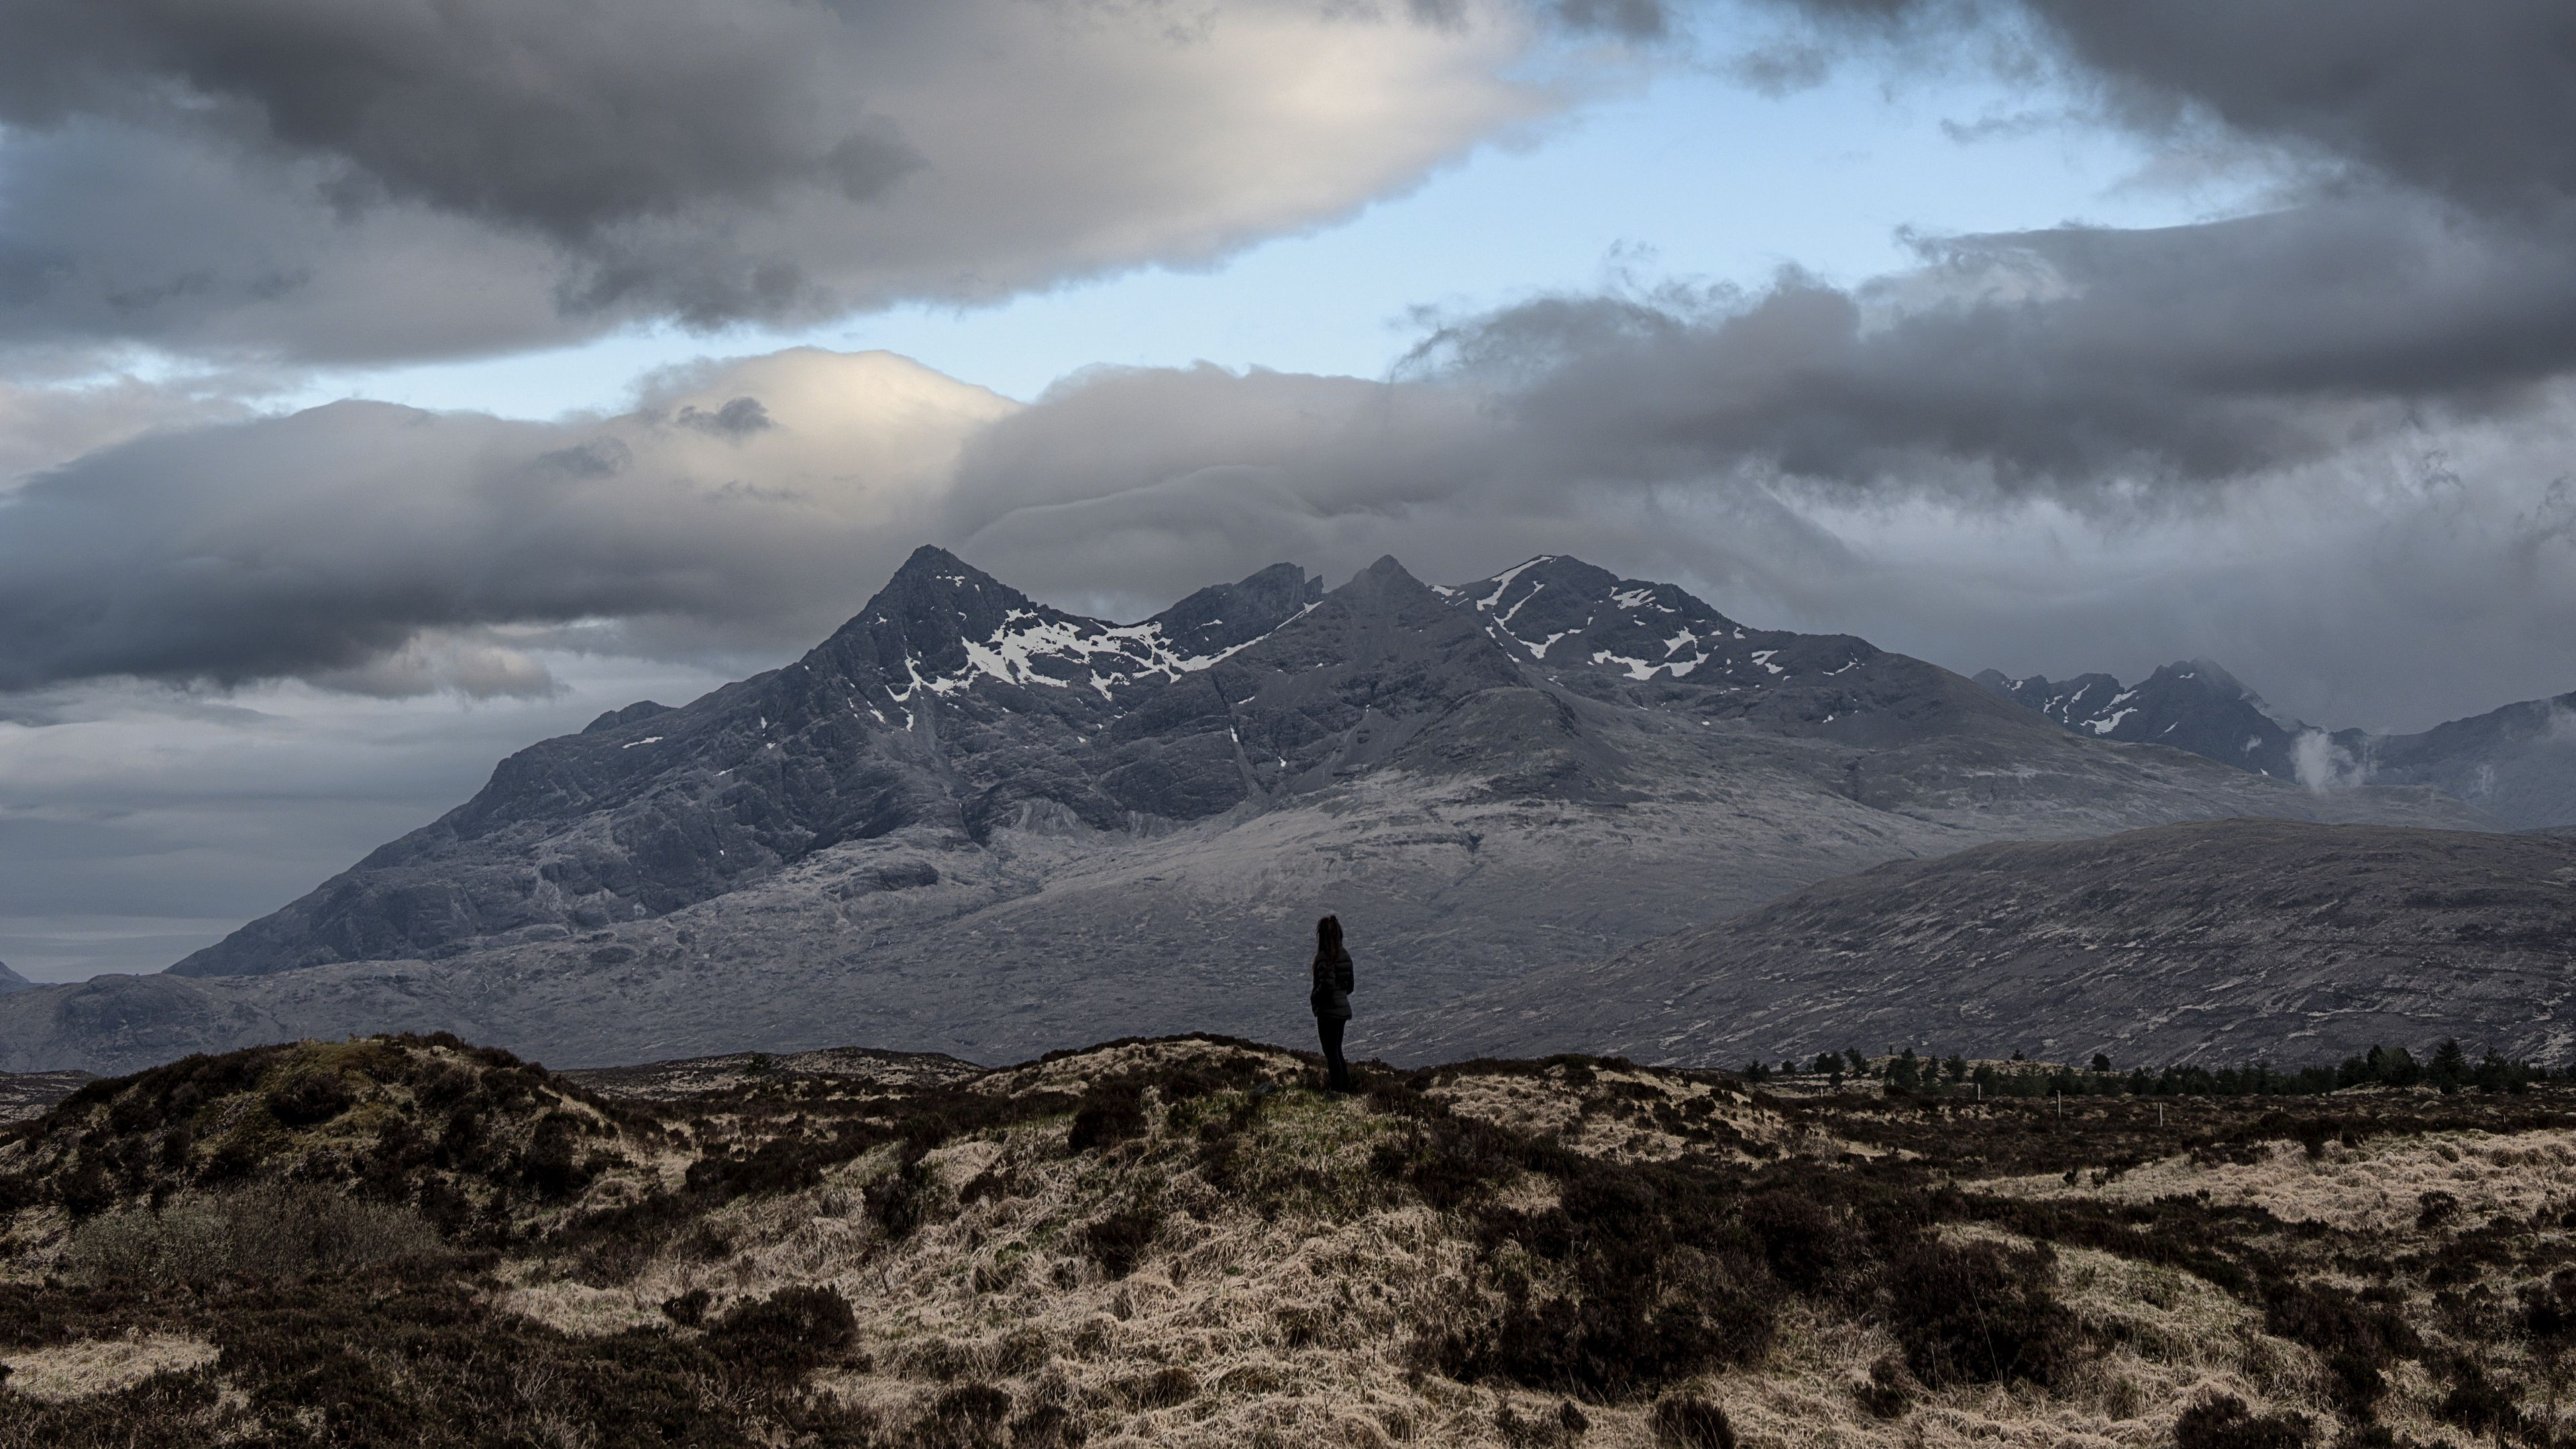 Mountains Solitude Alone Distance Island Isle Of Skye United